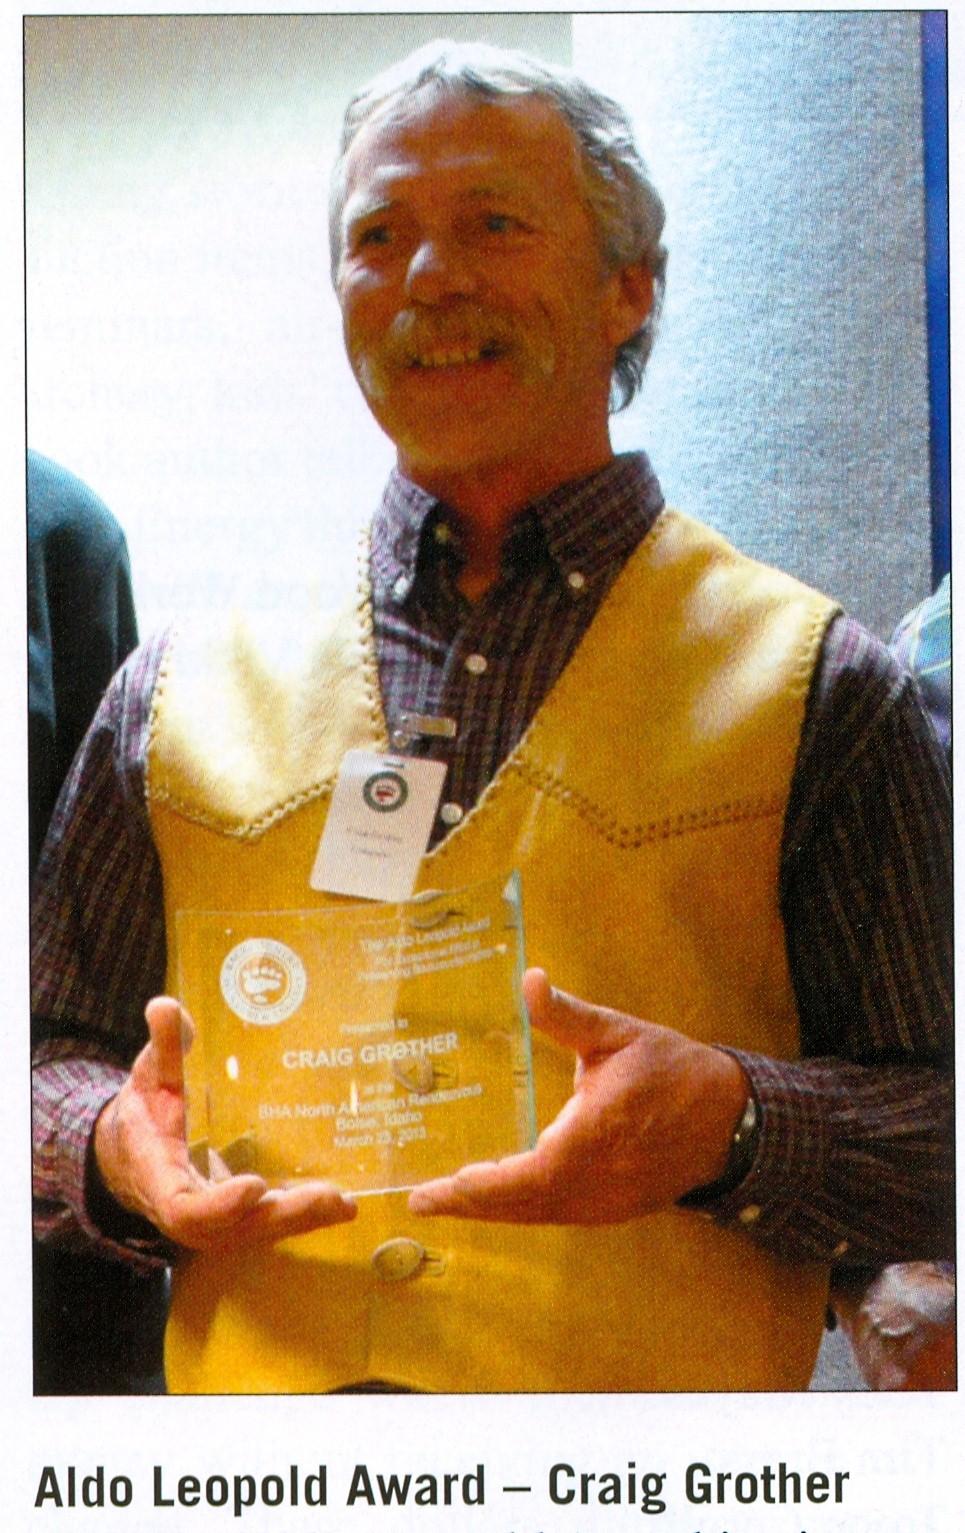 21-BHA-Awards-CGrother-ALeopold_Award-Mar13-BCJ-Summer13.jpg